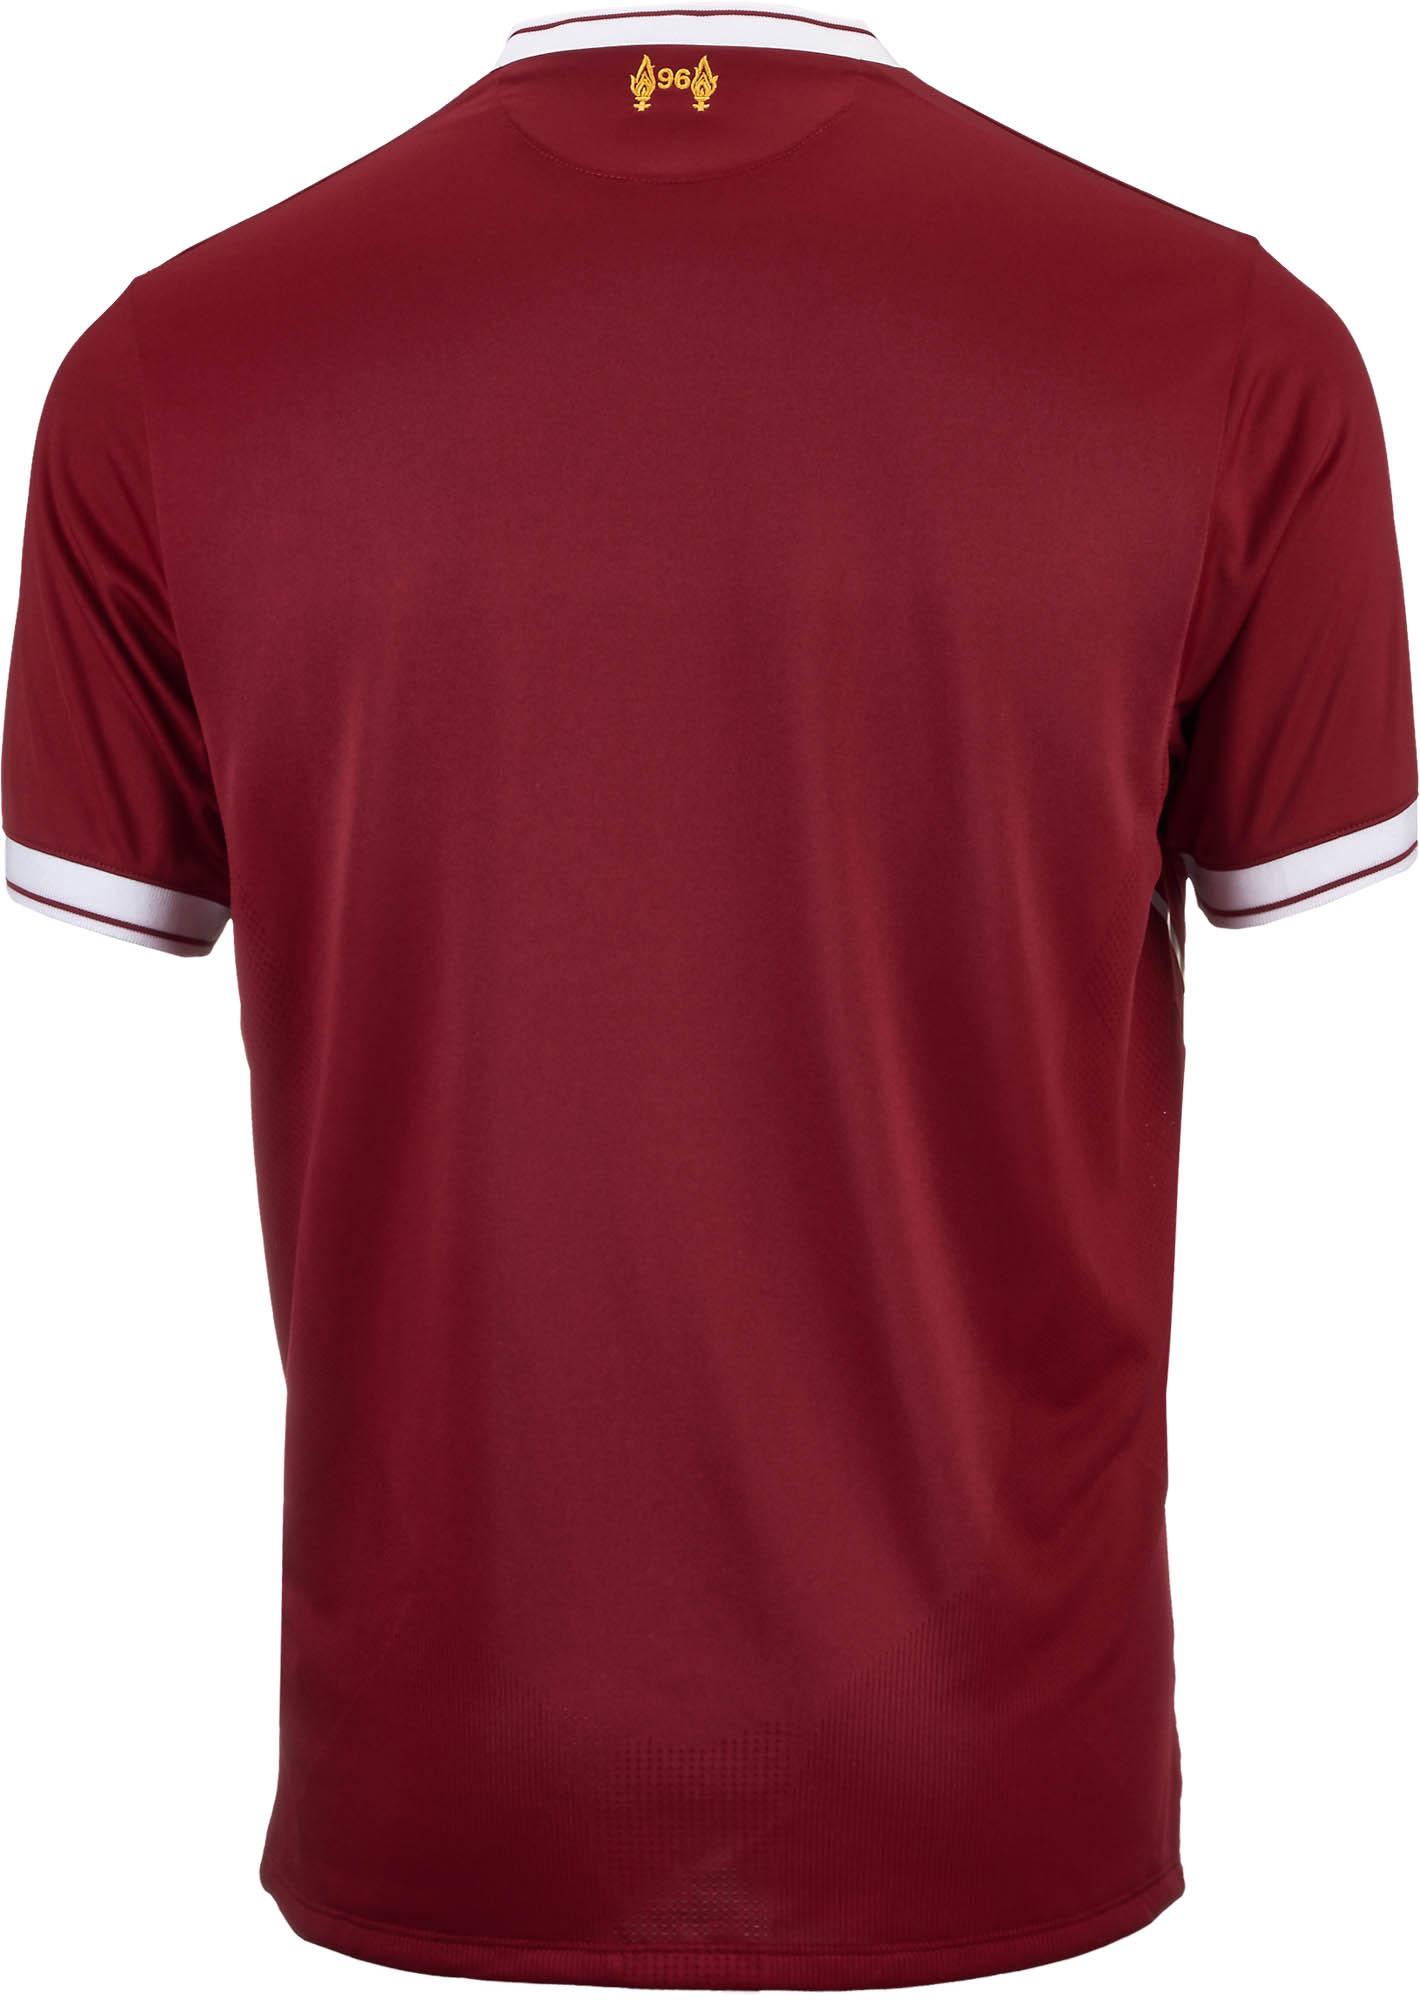 ddadd9ff50c Buy Replica Lasswade High School Kids Shirt